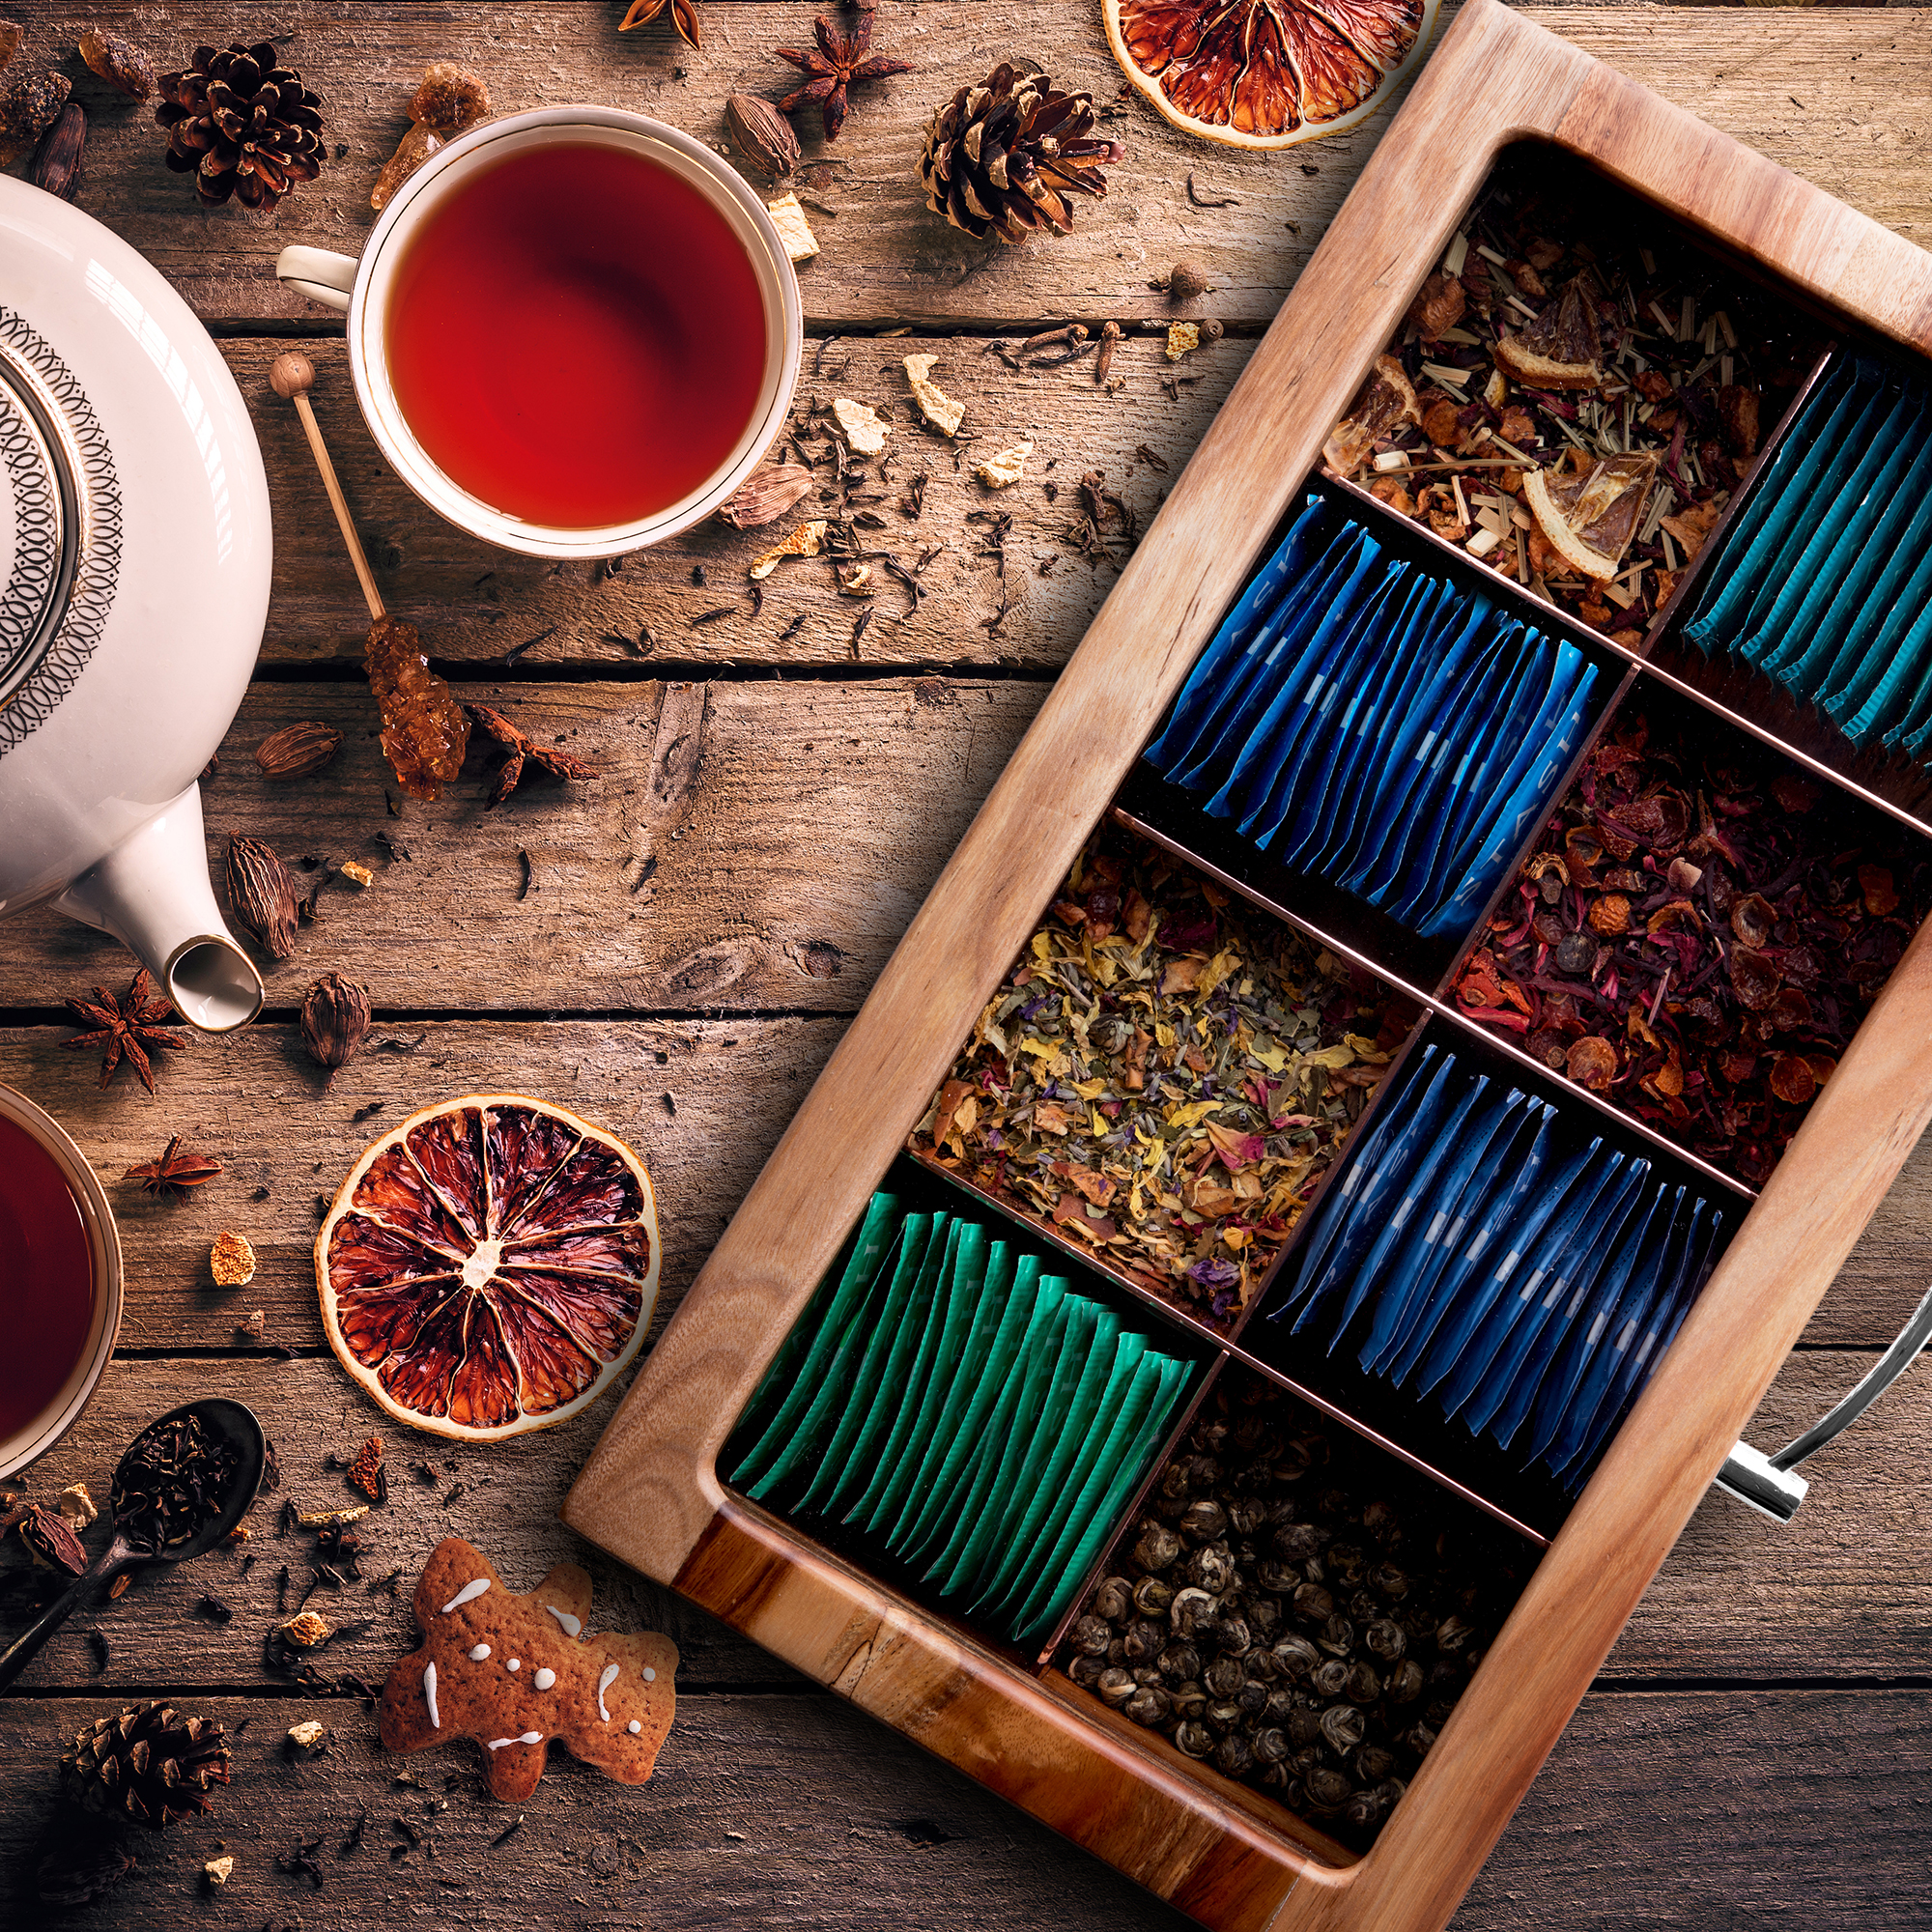 Mijenko-Tea-Storage - This solid hardwood box with stainless steel dividers stores tea bags and loose tea alike.